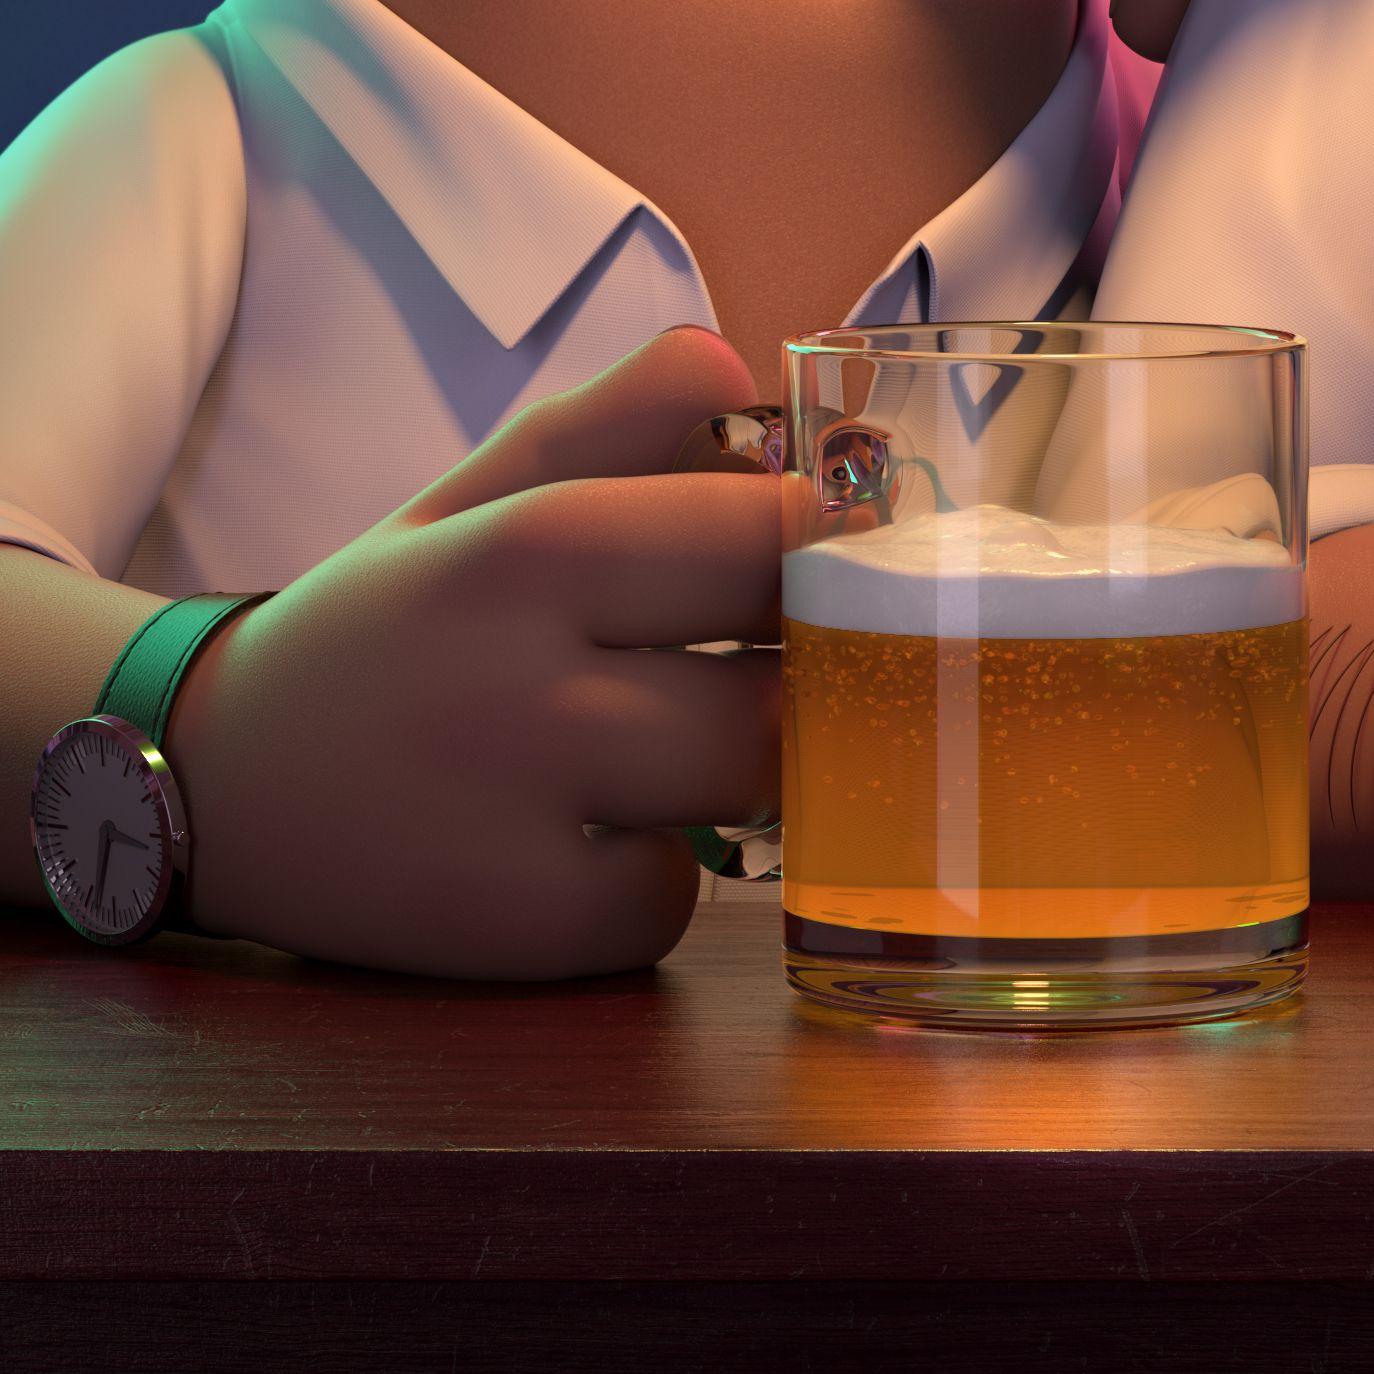 Pub Guys Render 4k Detail 3 Javierpedreno